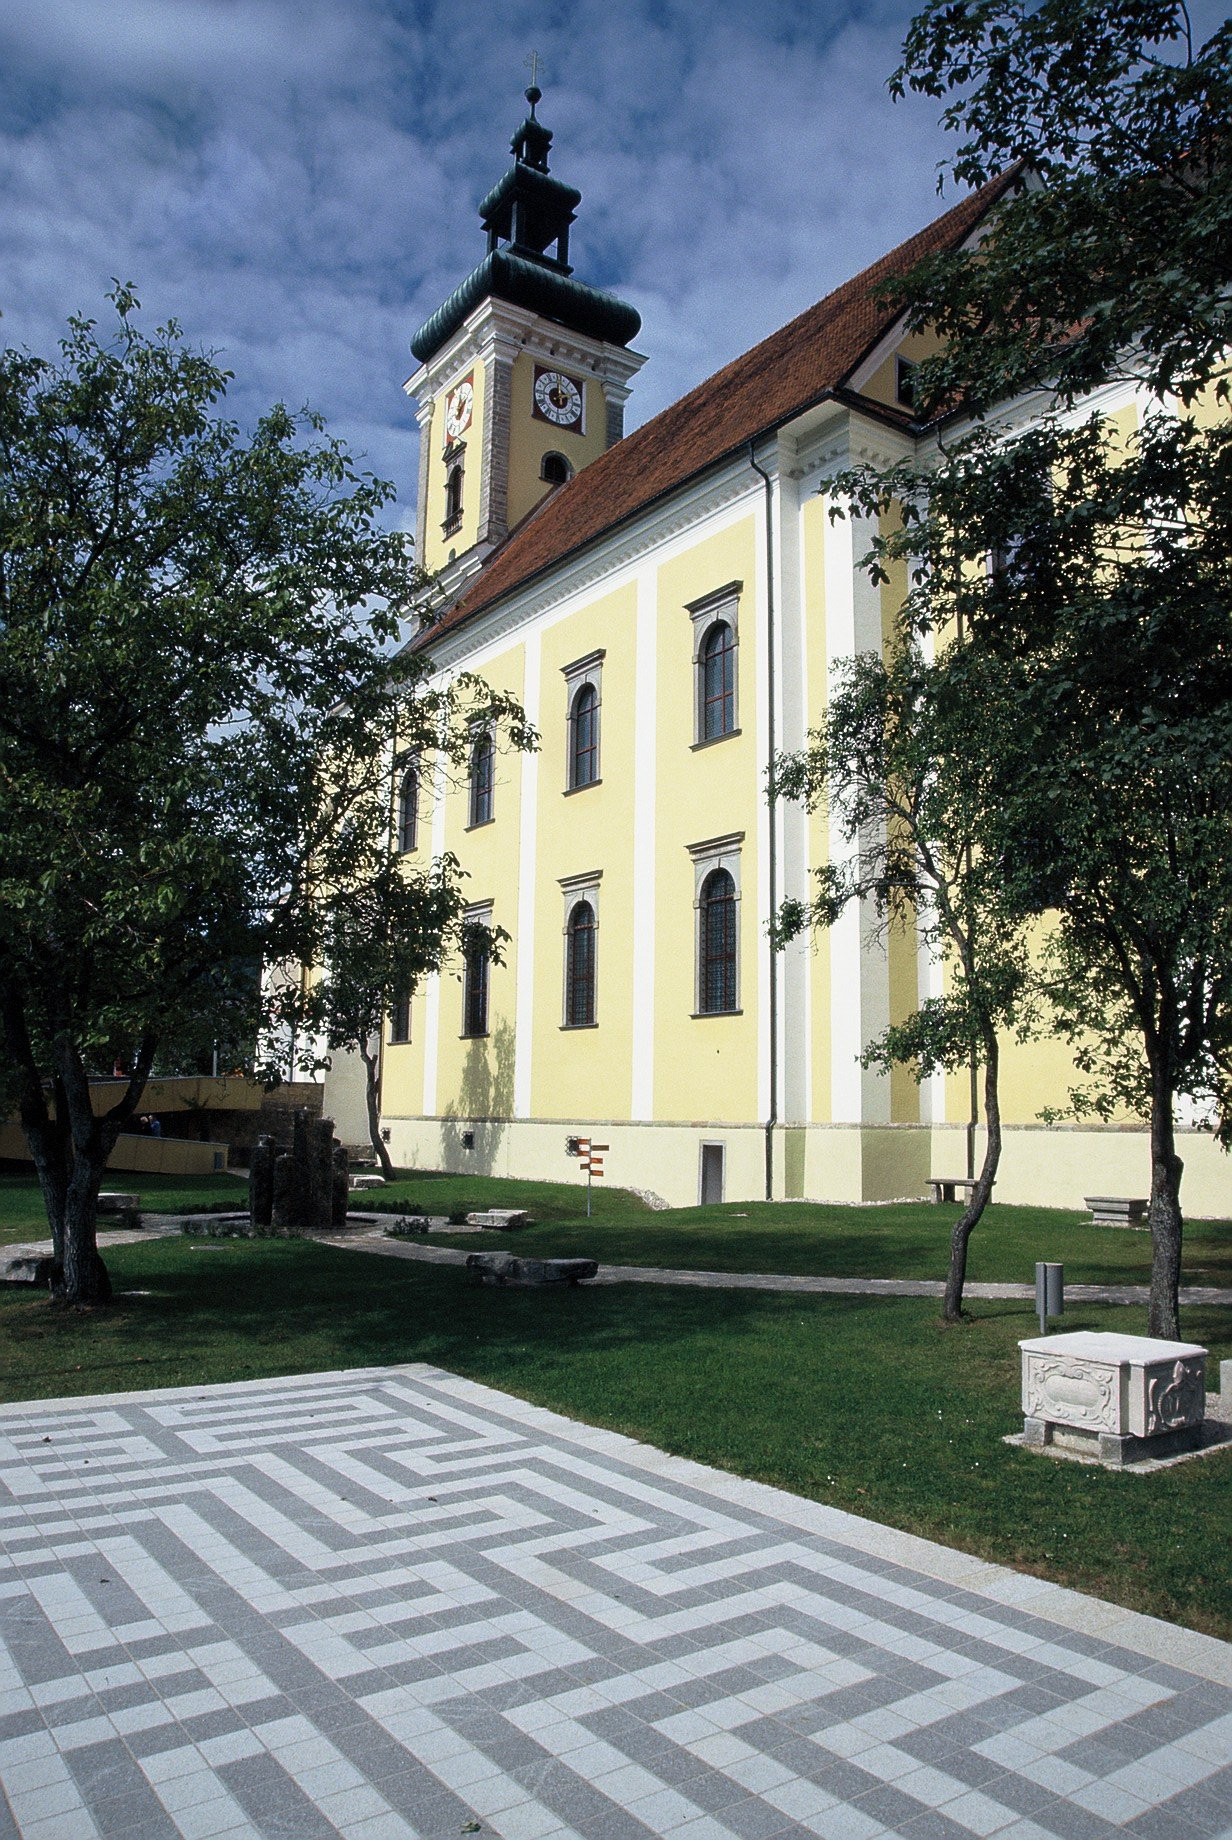 Waldhausen Kirchenplatz2